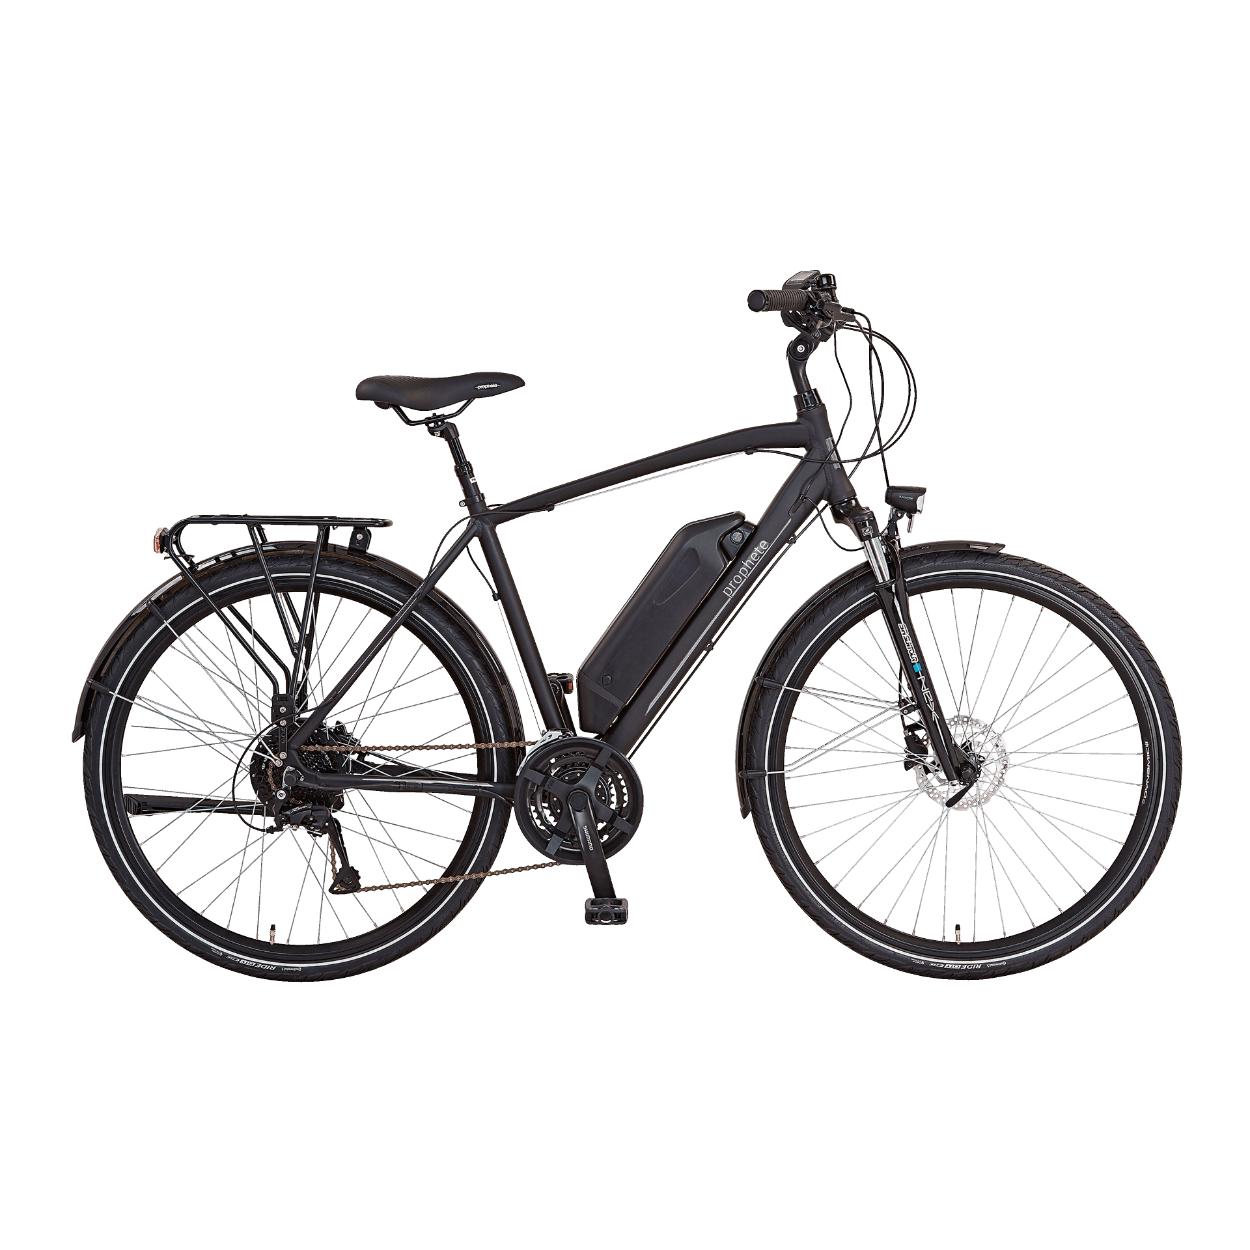 "PROPHETE Alu-Trekking-E-Bike UNISEX met 28"" achterwielmotor"